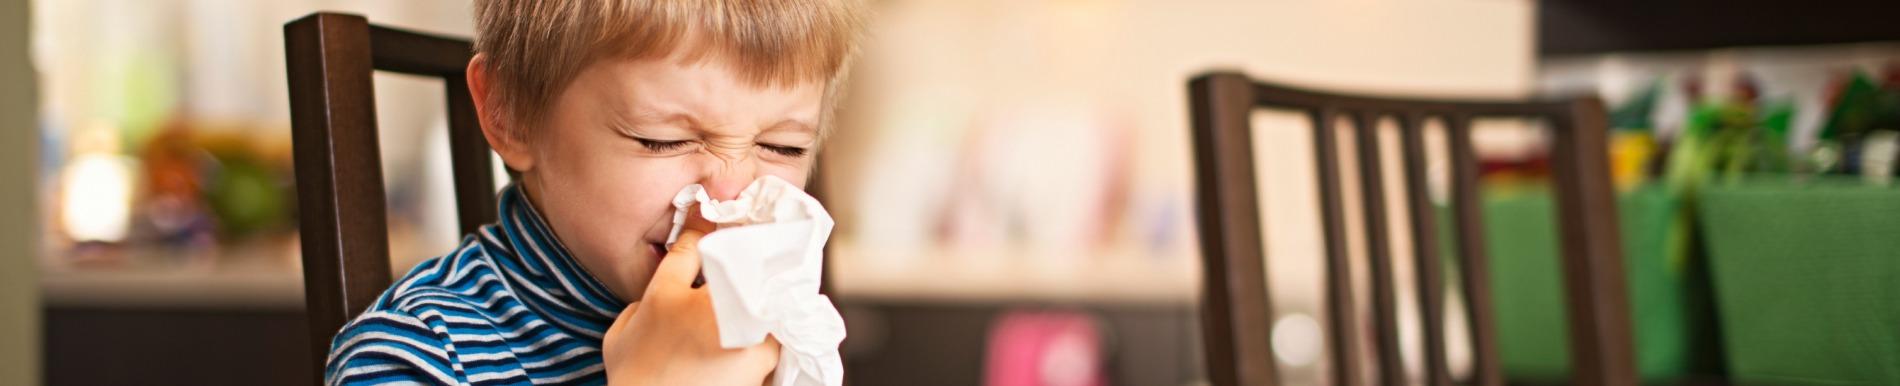 https://www.healthychildren.org/SiteCollectionImage-Homepage-Banners/boy_table_sneeze_banner.jpg